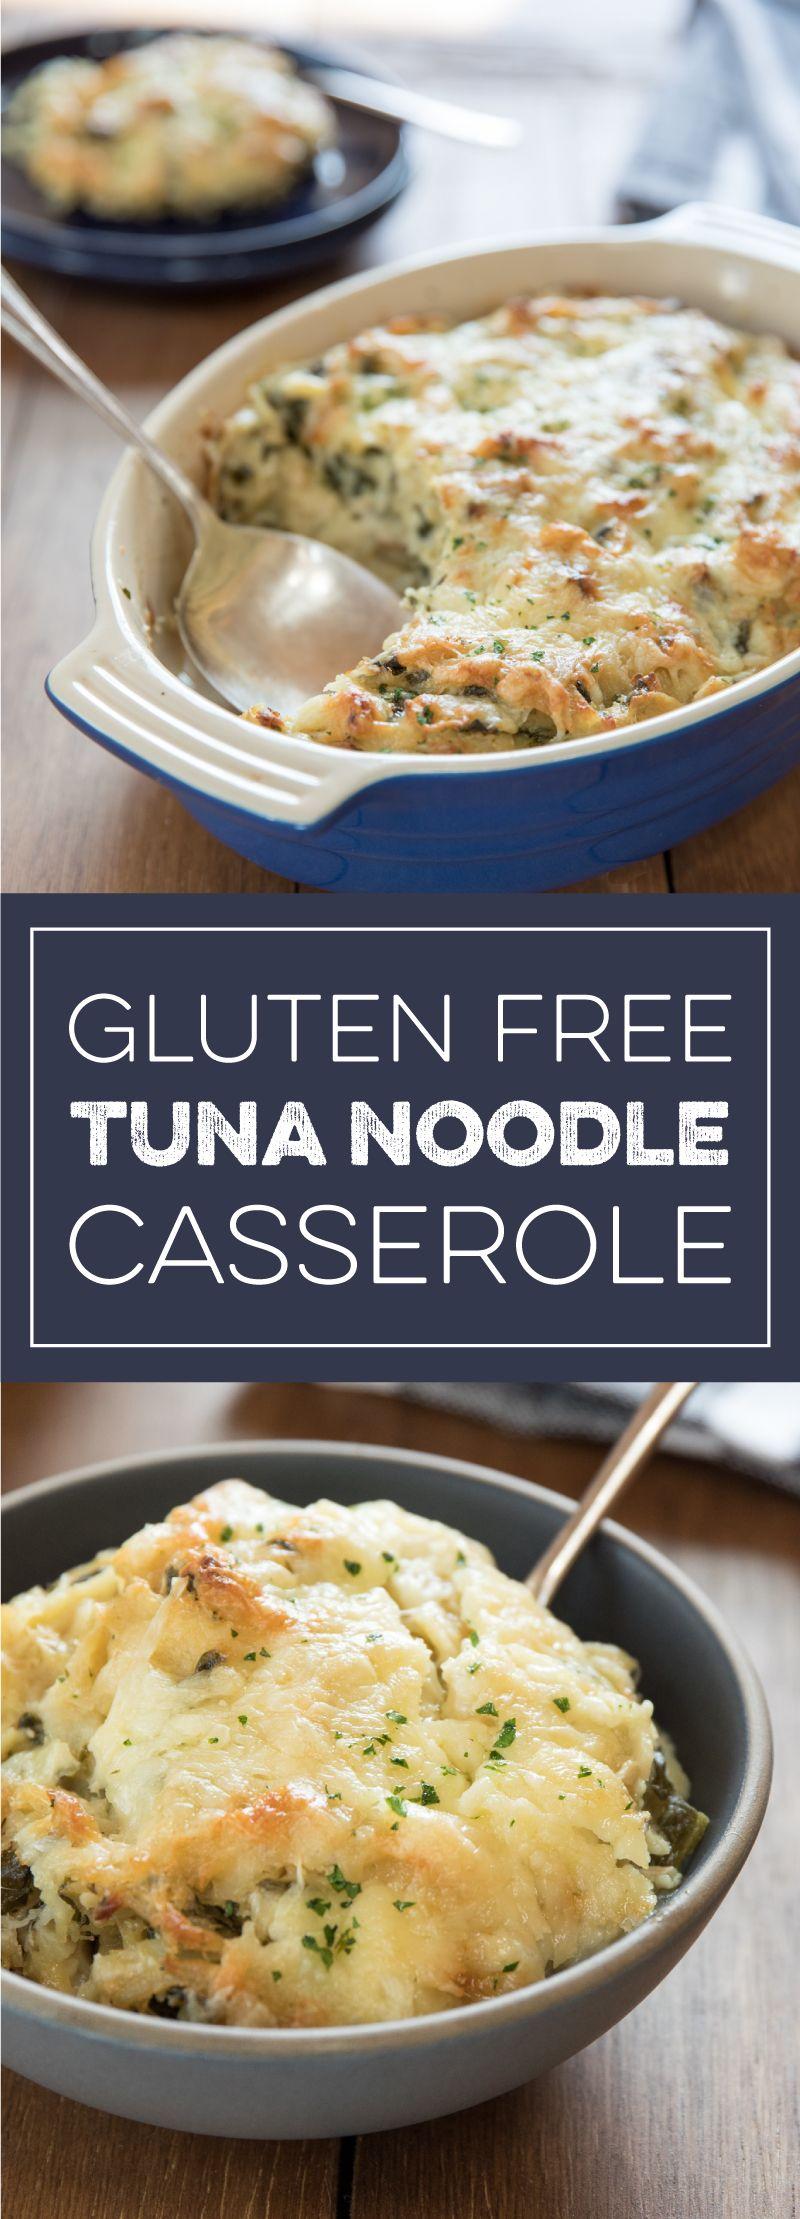 Gluten Free Tuna Noodle Casserole in 2020 | Noodle ...